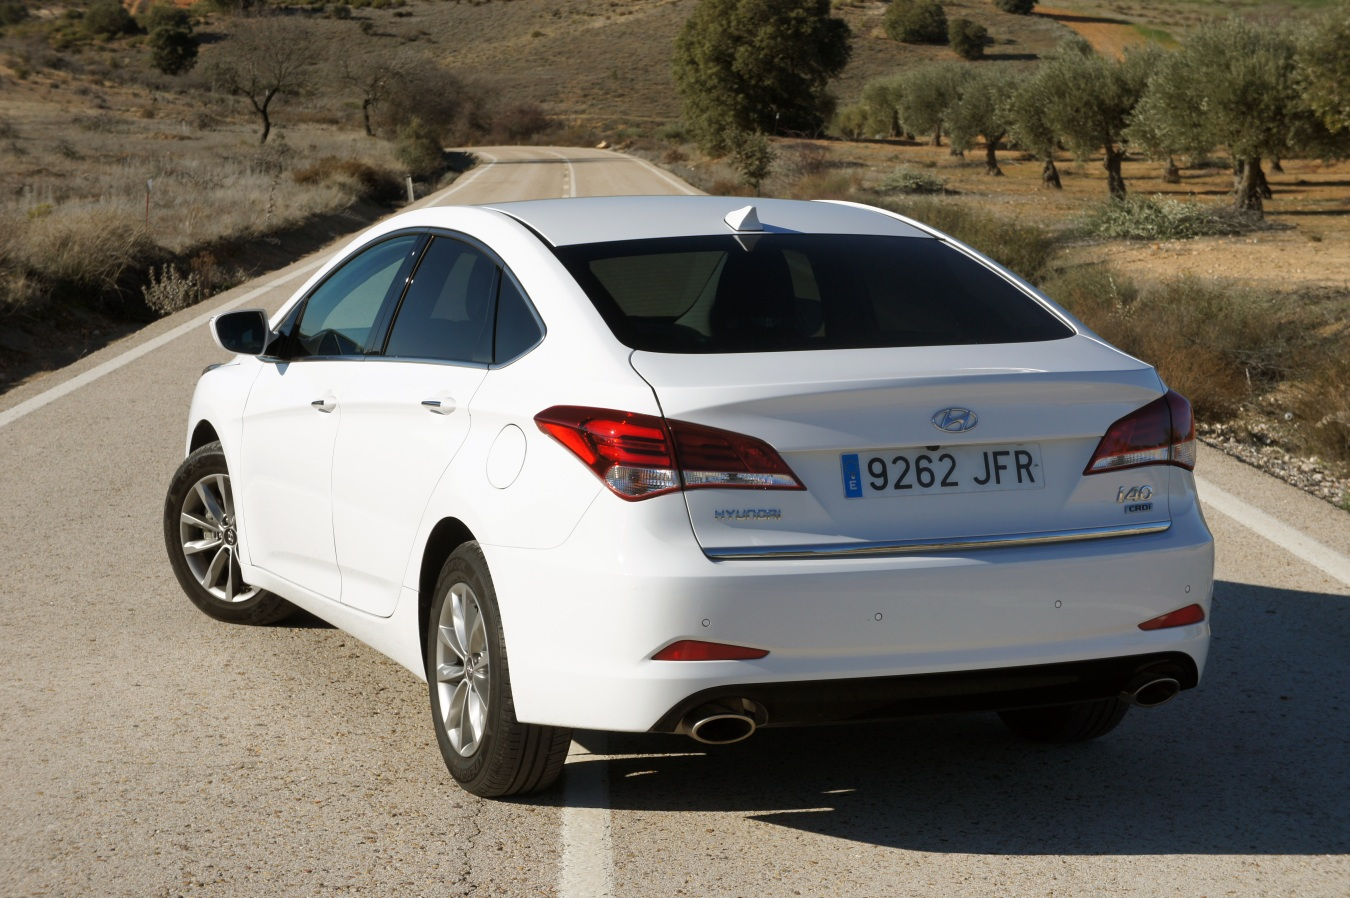 Prueba-Hyundai-i4029